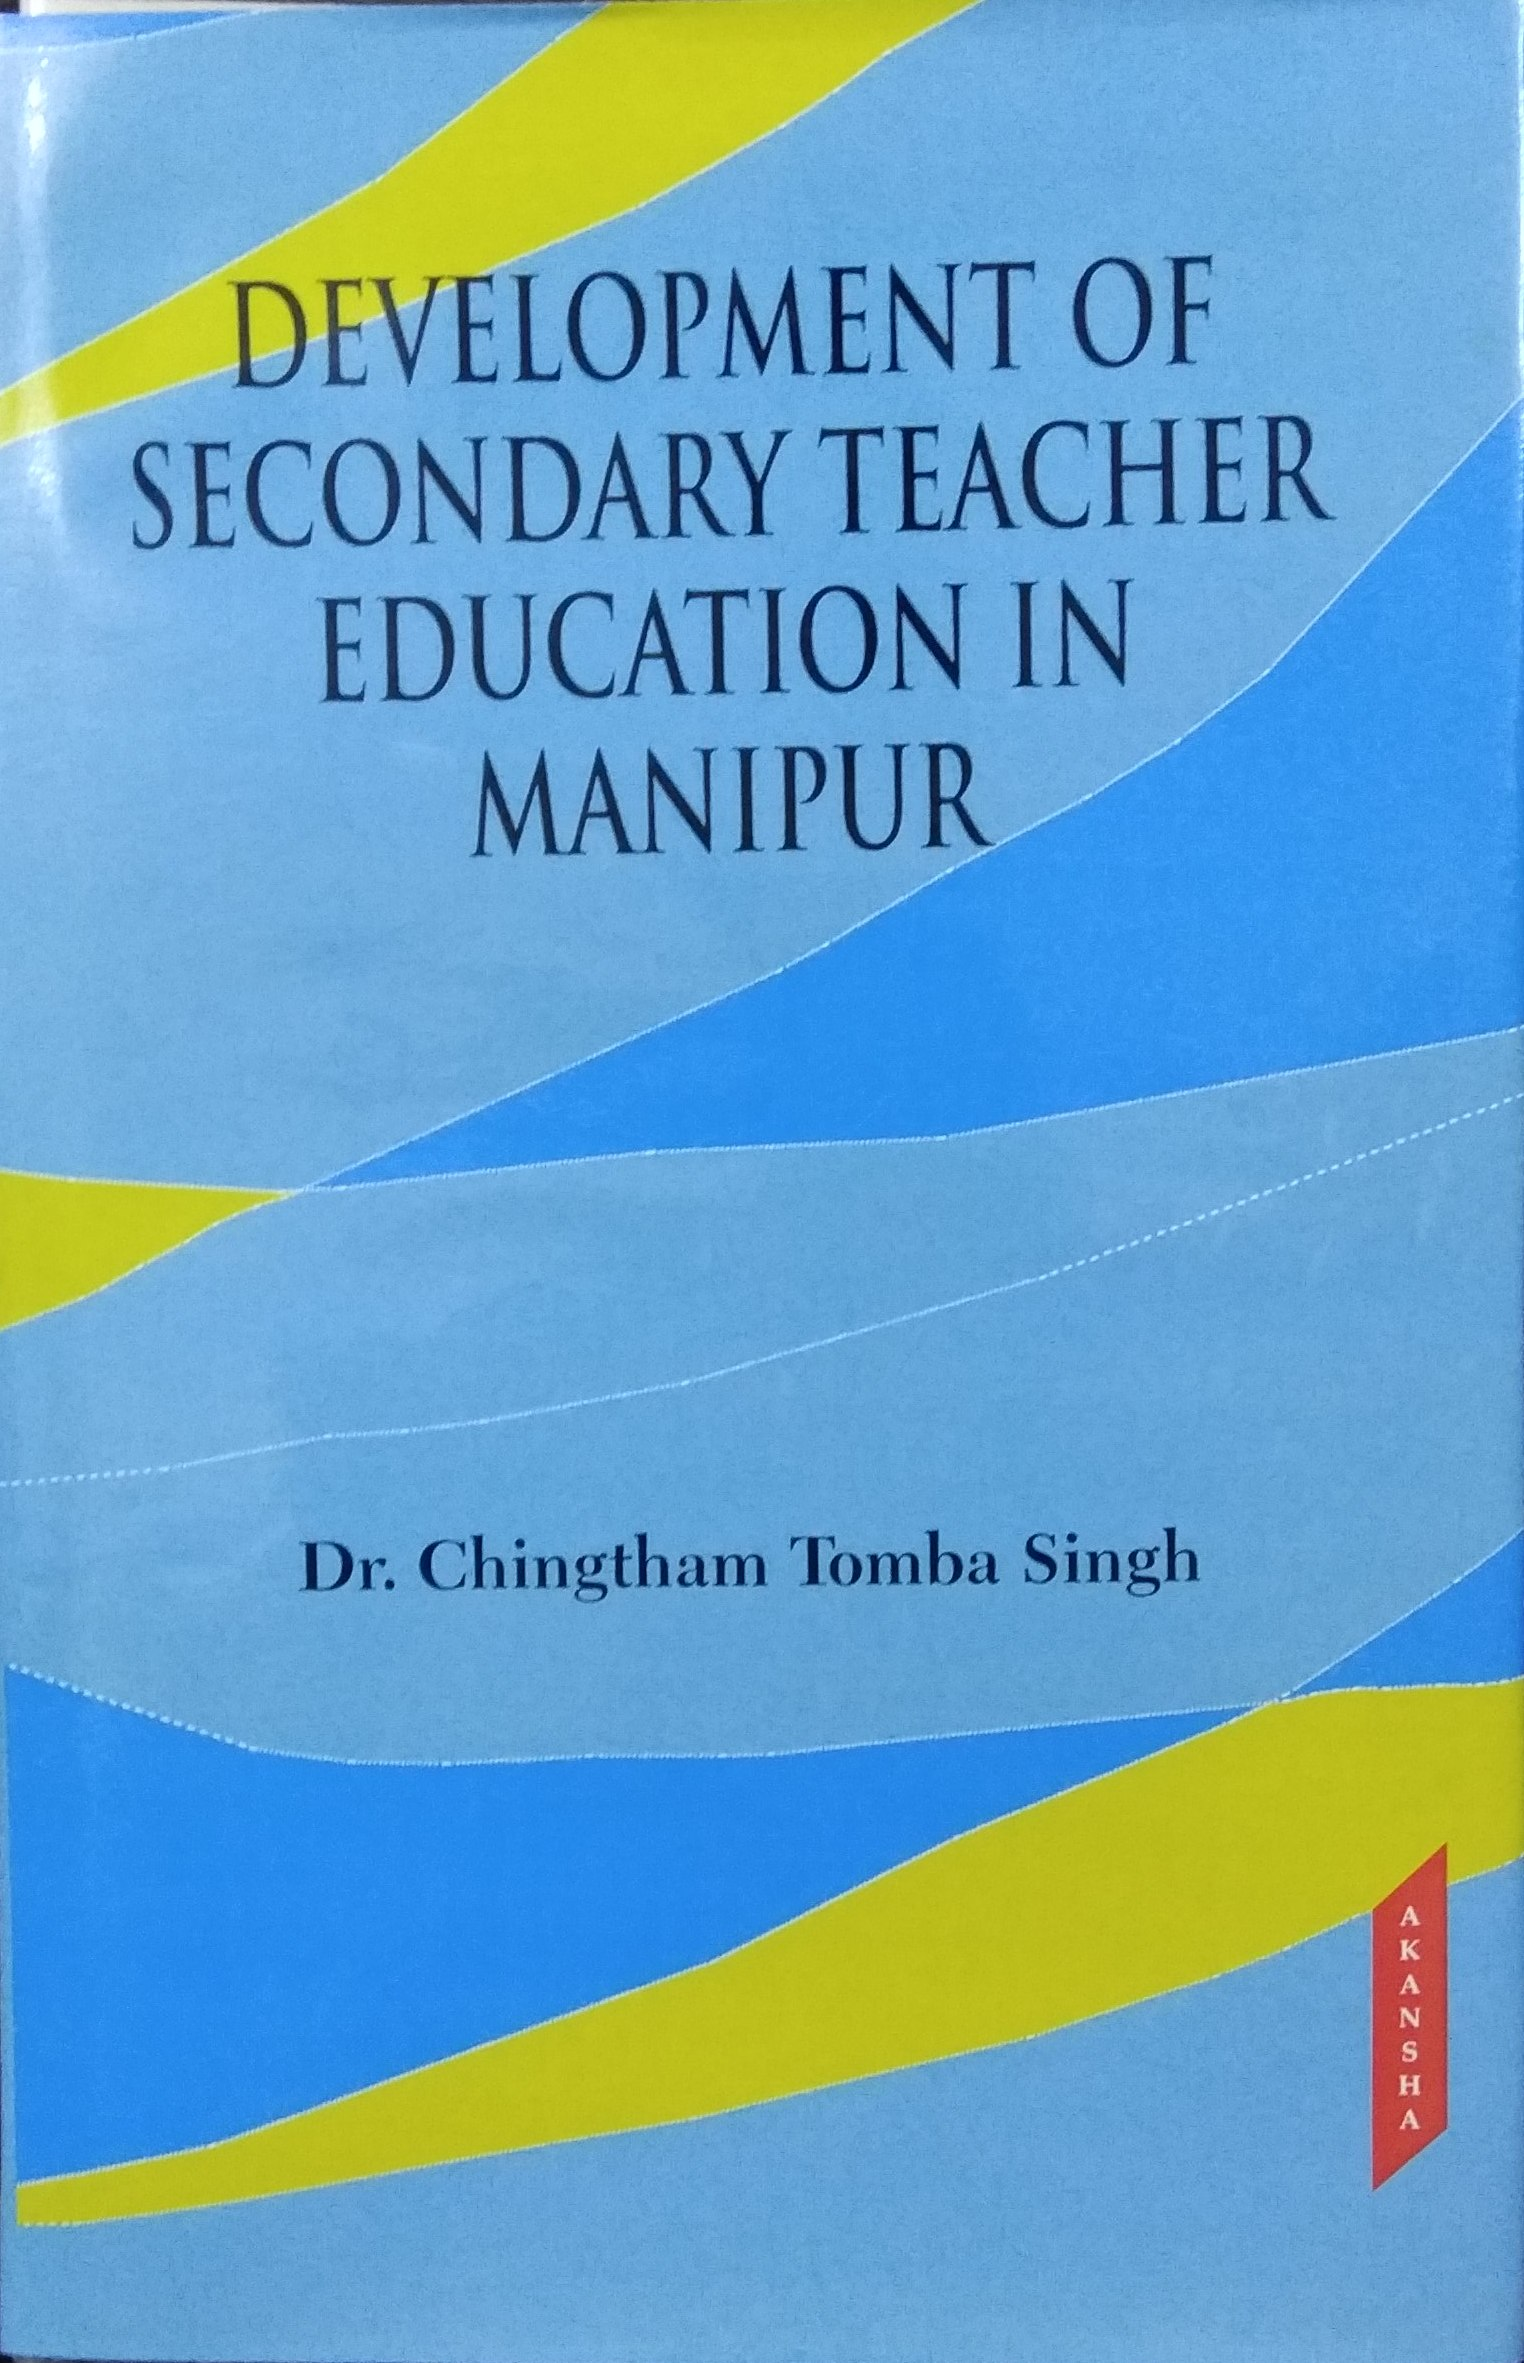 Development of Secondary Teacher Education in Mani…